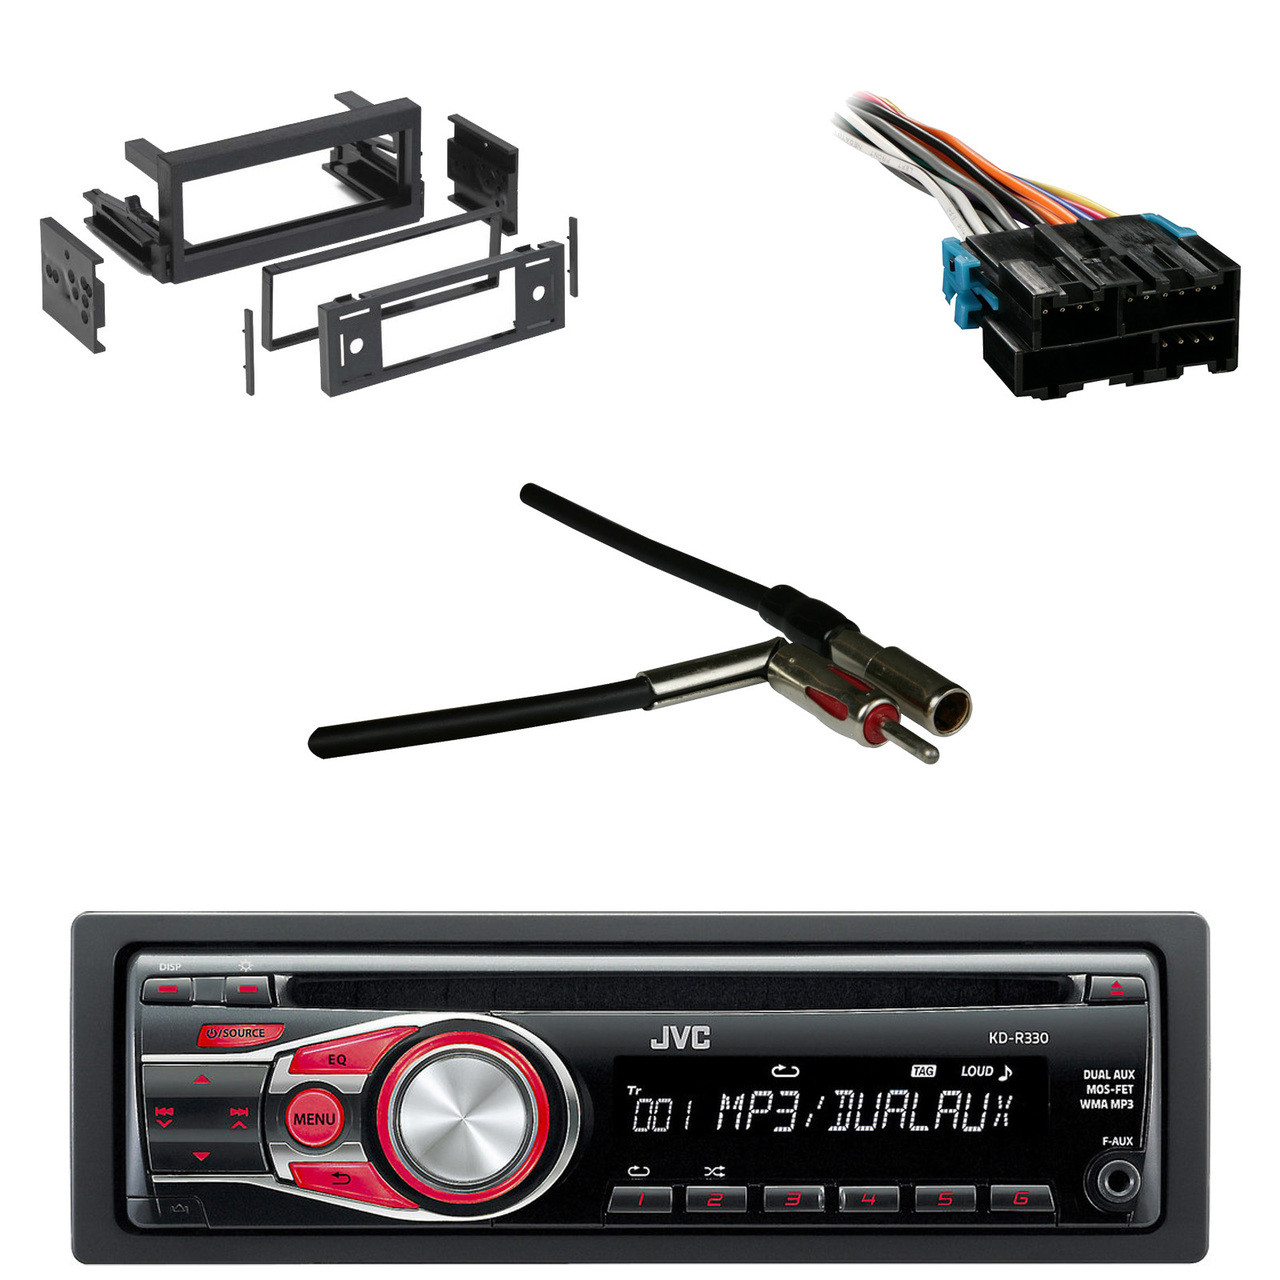 [DIAGRAM_3US]  JVC KDR330 CD AUX Car Radio, Antenn Adapter, GM Wire Harness, GM Dash  Install Kit - Road Entertainment   Jvc Car Audio Wiring Harness      Road Entertainment